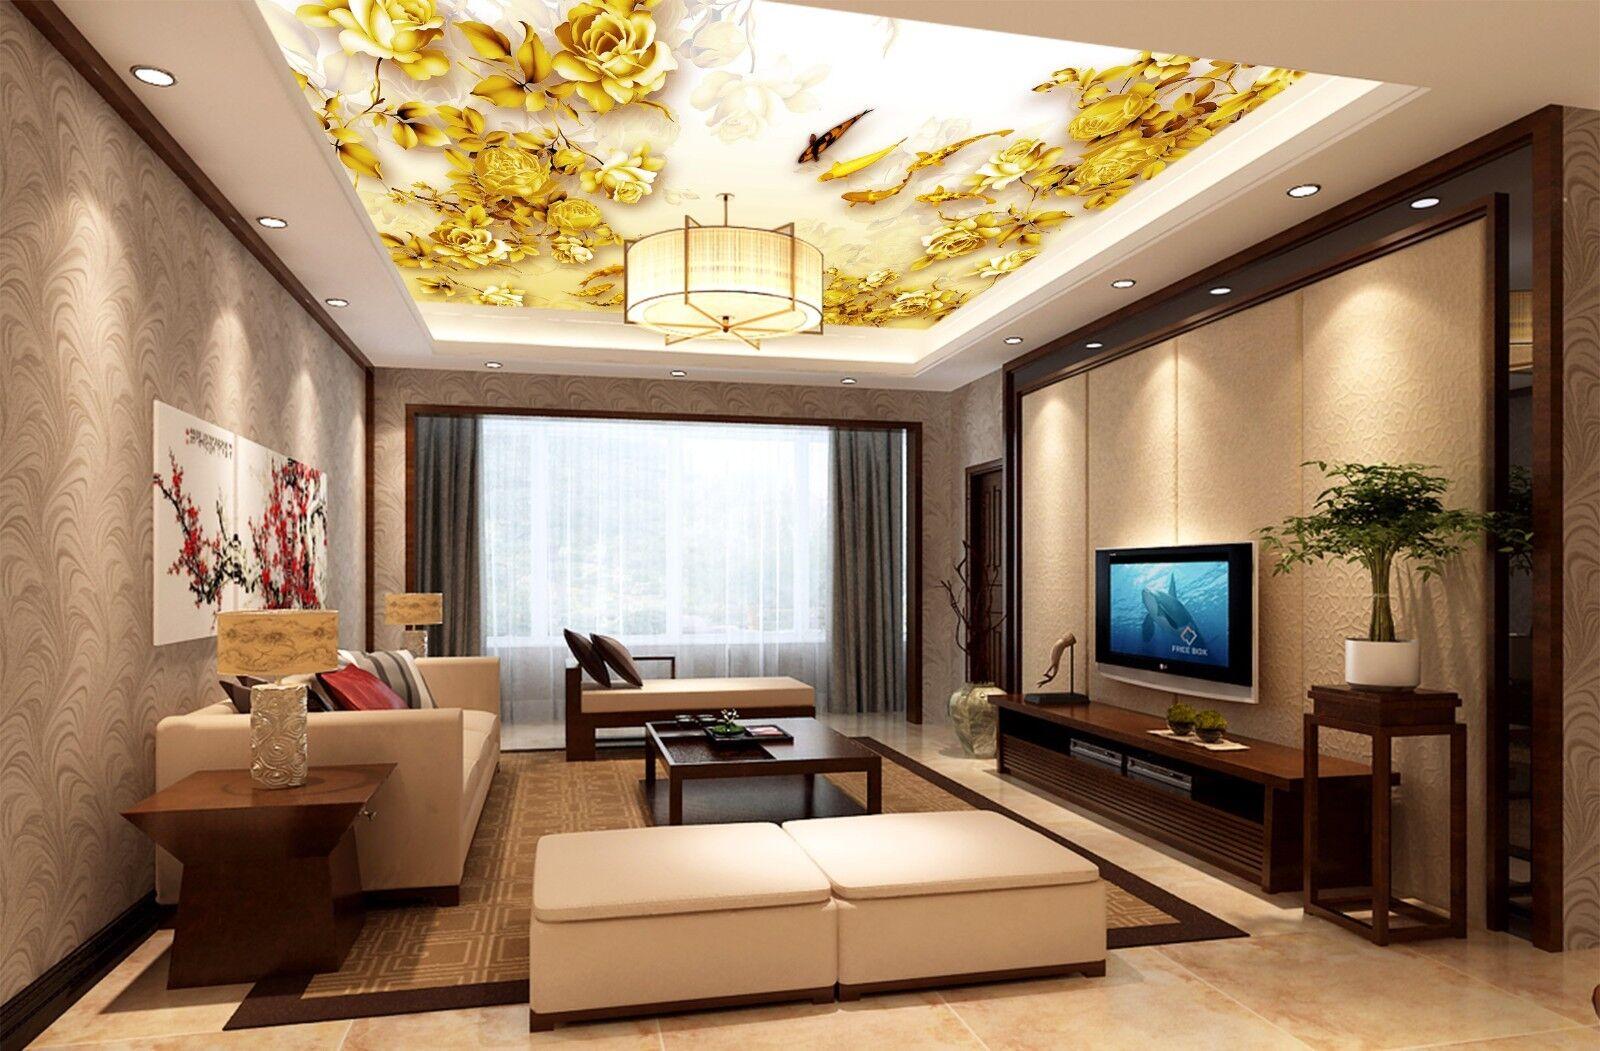 3D gold Peony Fish 42 Ceiling Wall Paper Print Wall Indoor Wall Murals CA Jenny